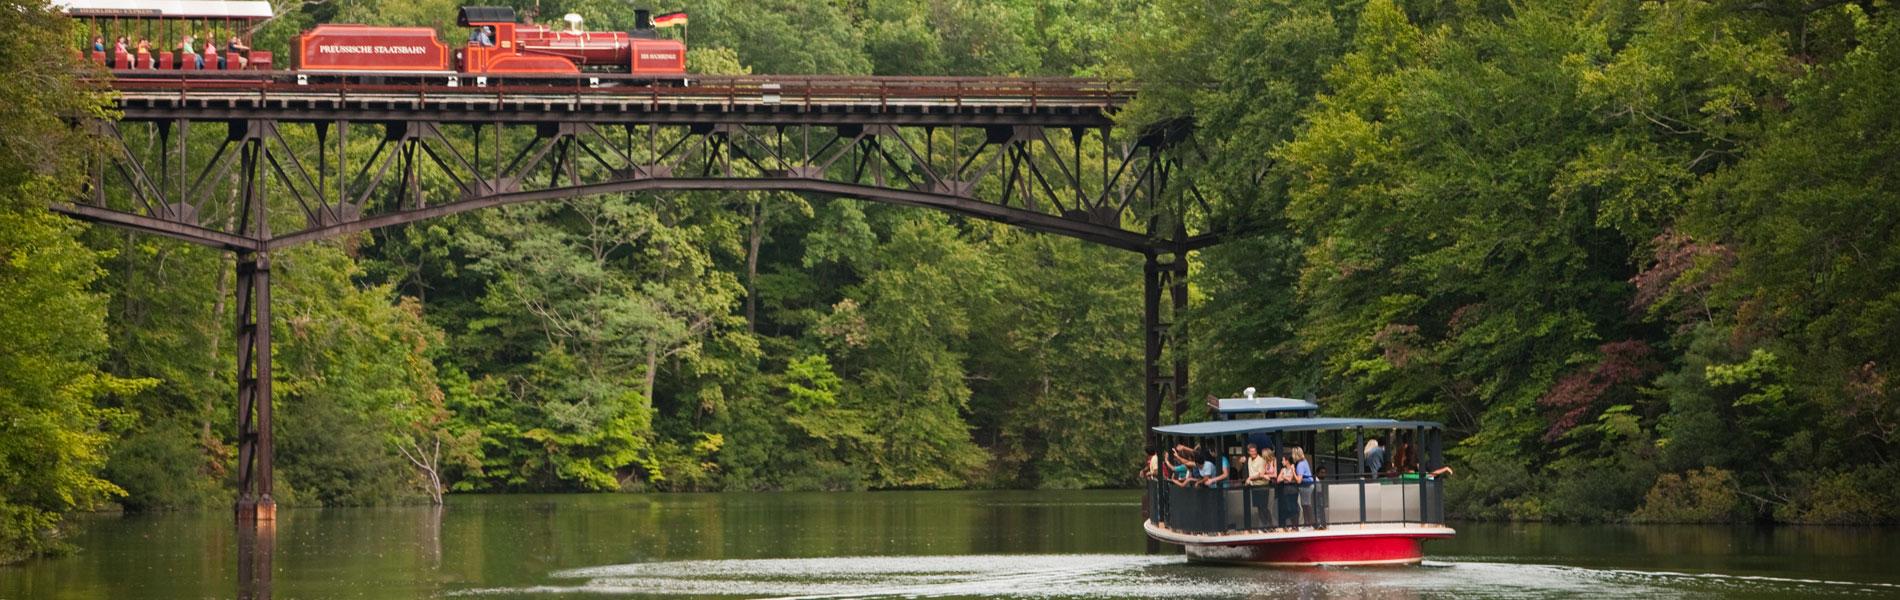 Rhine River Cruise - Boat Ride